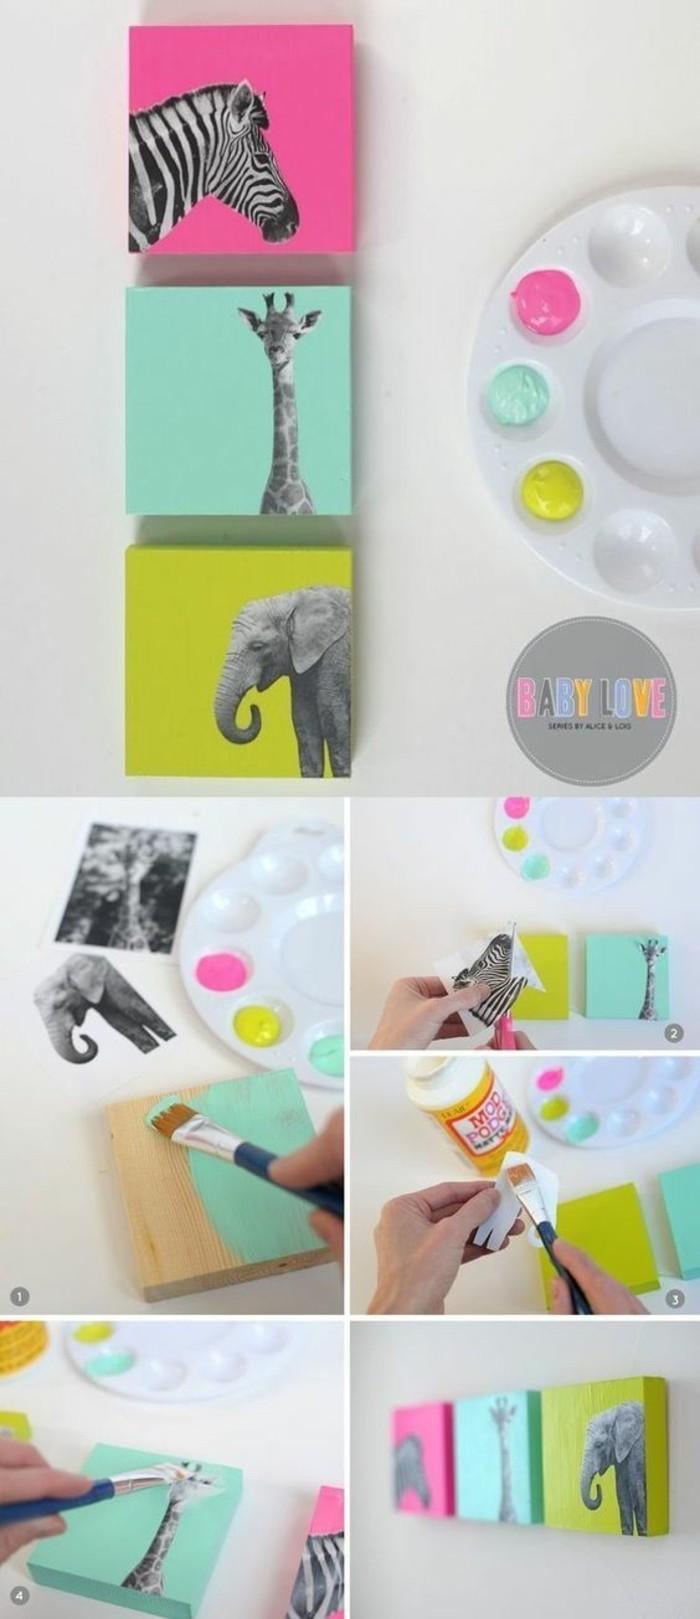 step by step, diy tutorial, painted wooden blocks, glued animal photos, girl room decor ideas